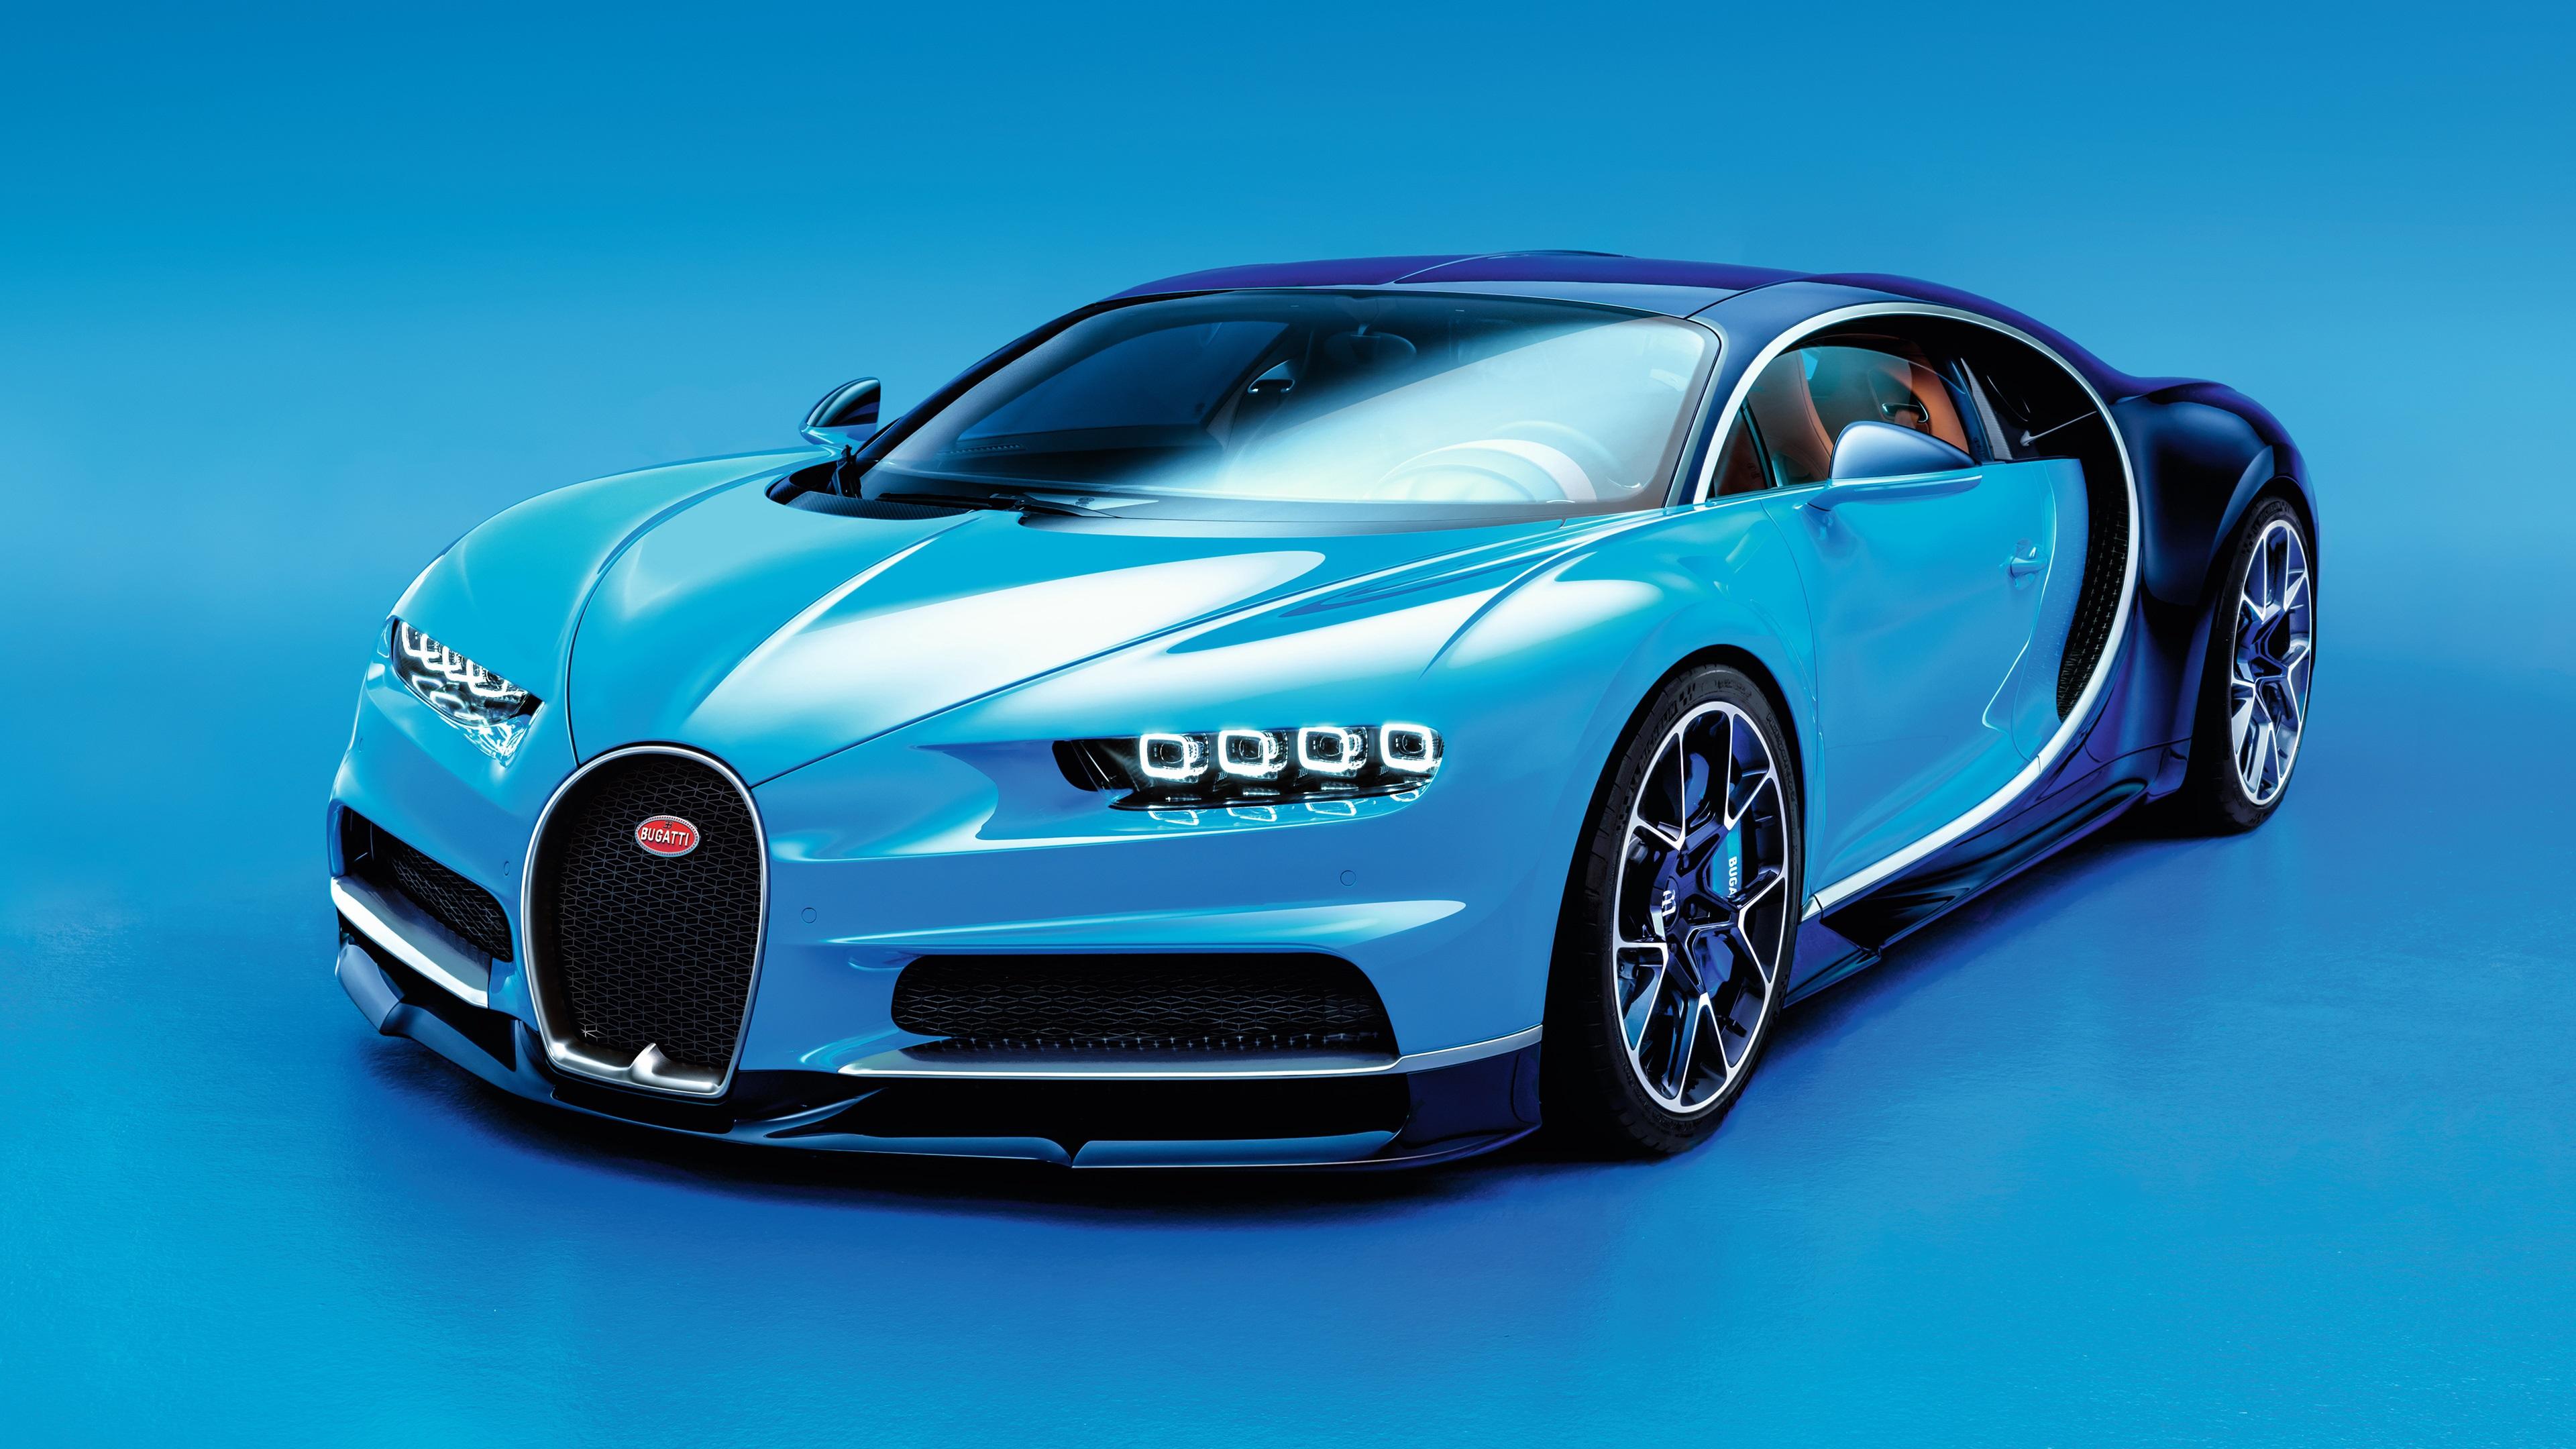 Bugatti Chiron Blue Supercar 1080x1920 Iphone 8 7 6 6s Plus Wallpaper Background Picture Image